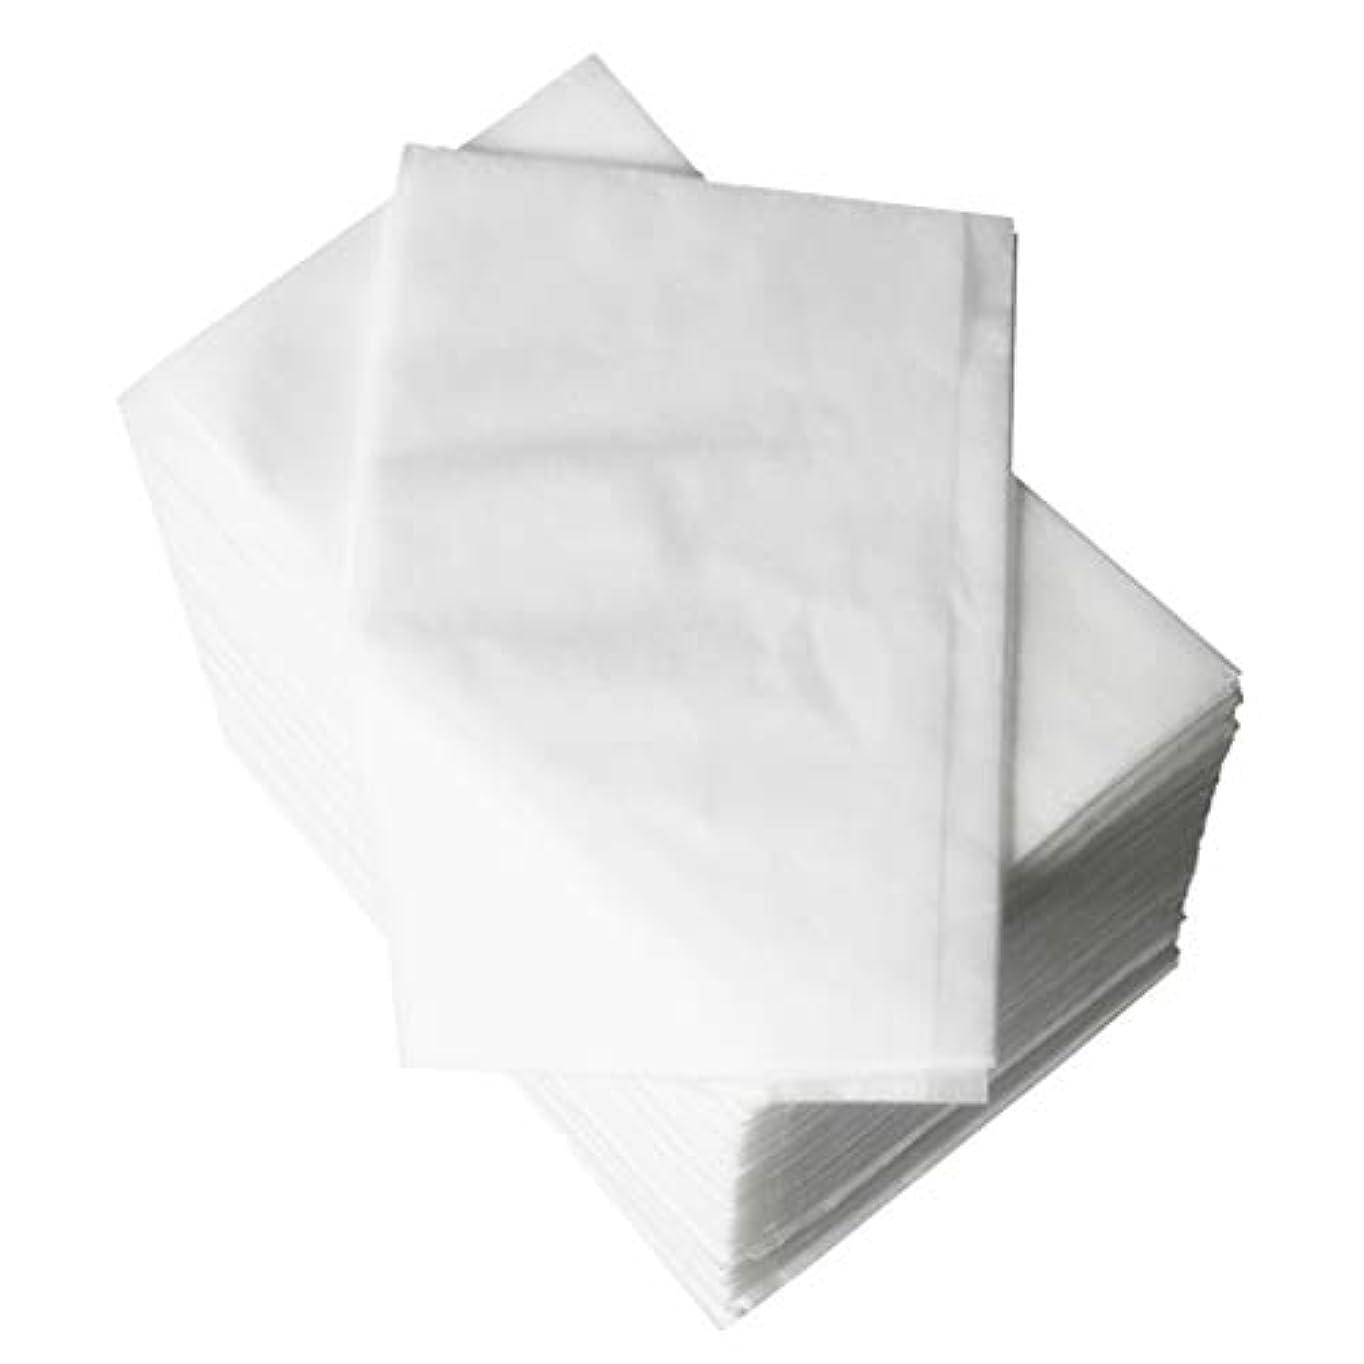 Hellery スパベッドカバー 使い捨て 耐久性 使い捨てベッドシーツ ブルー ホワイト - 白